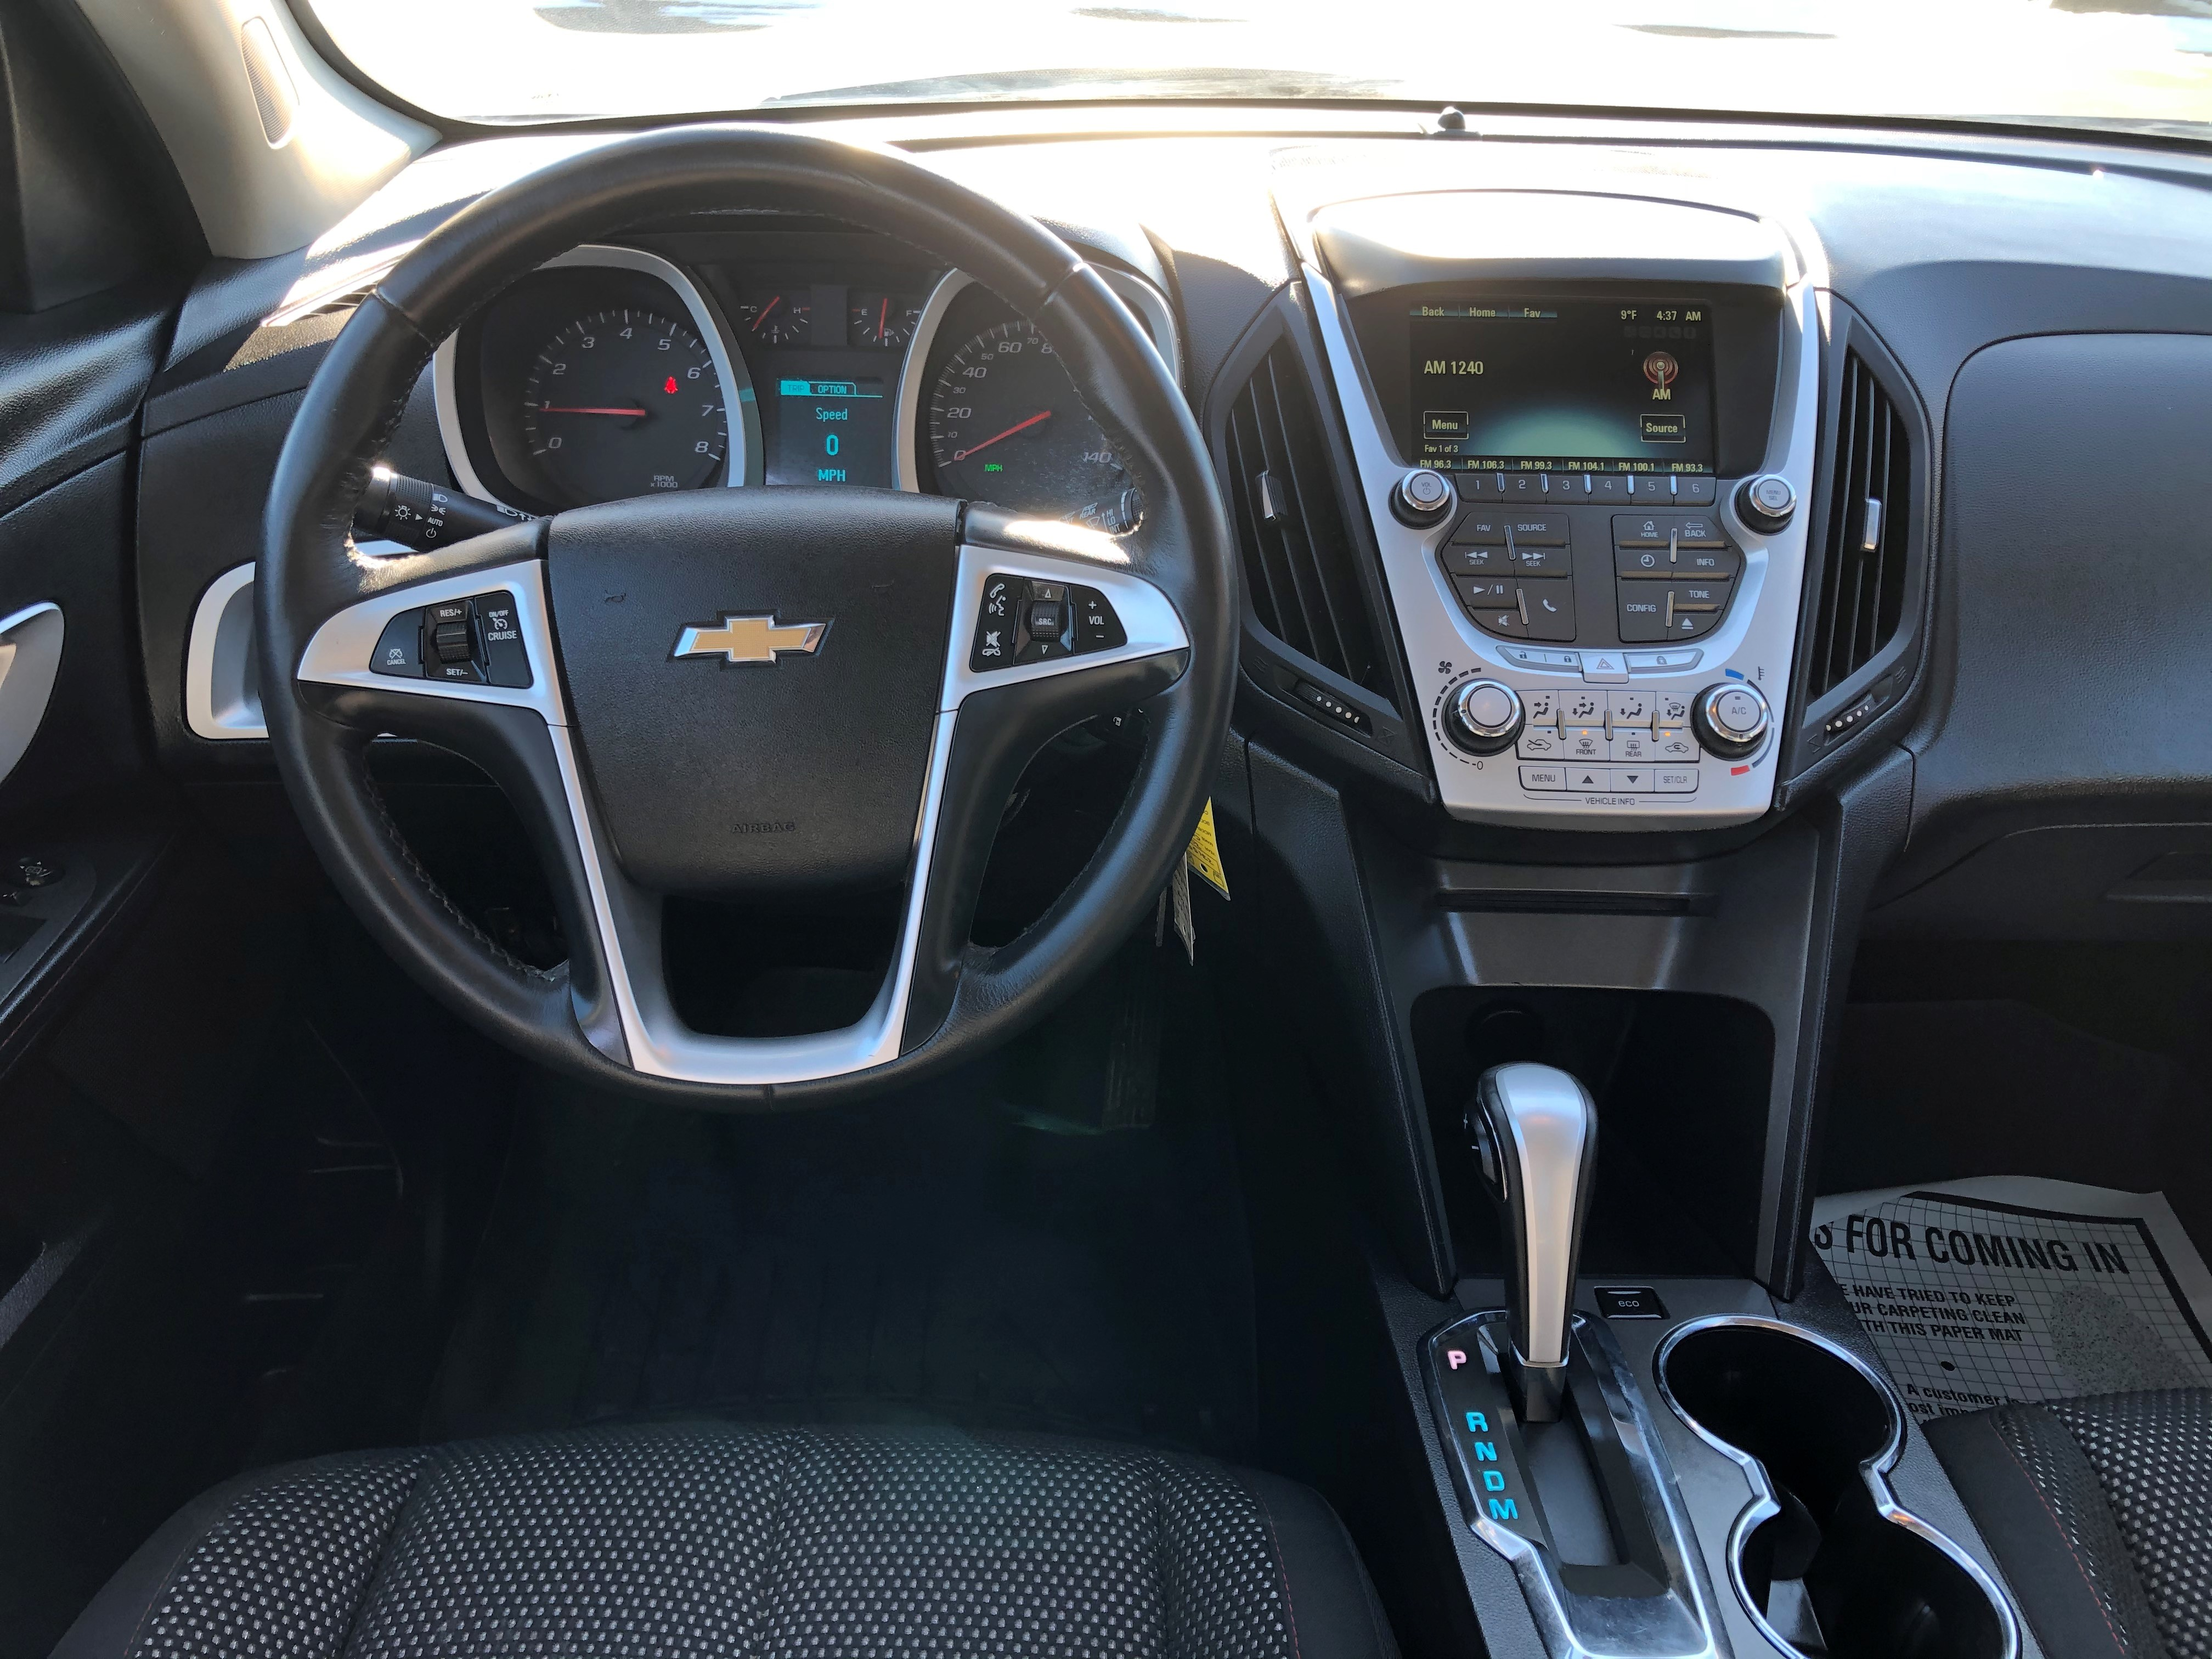 used vehicle - SUV CHEVROLET EQUINOX 2015